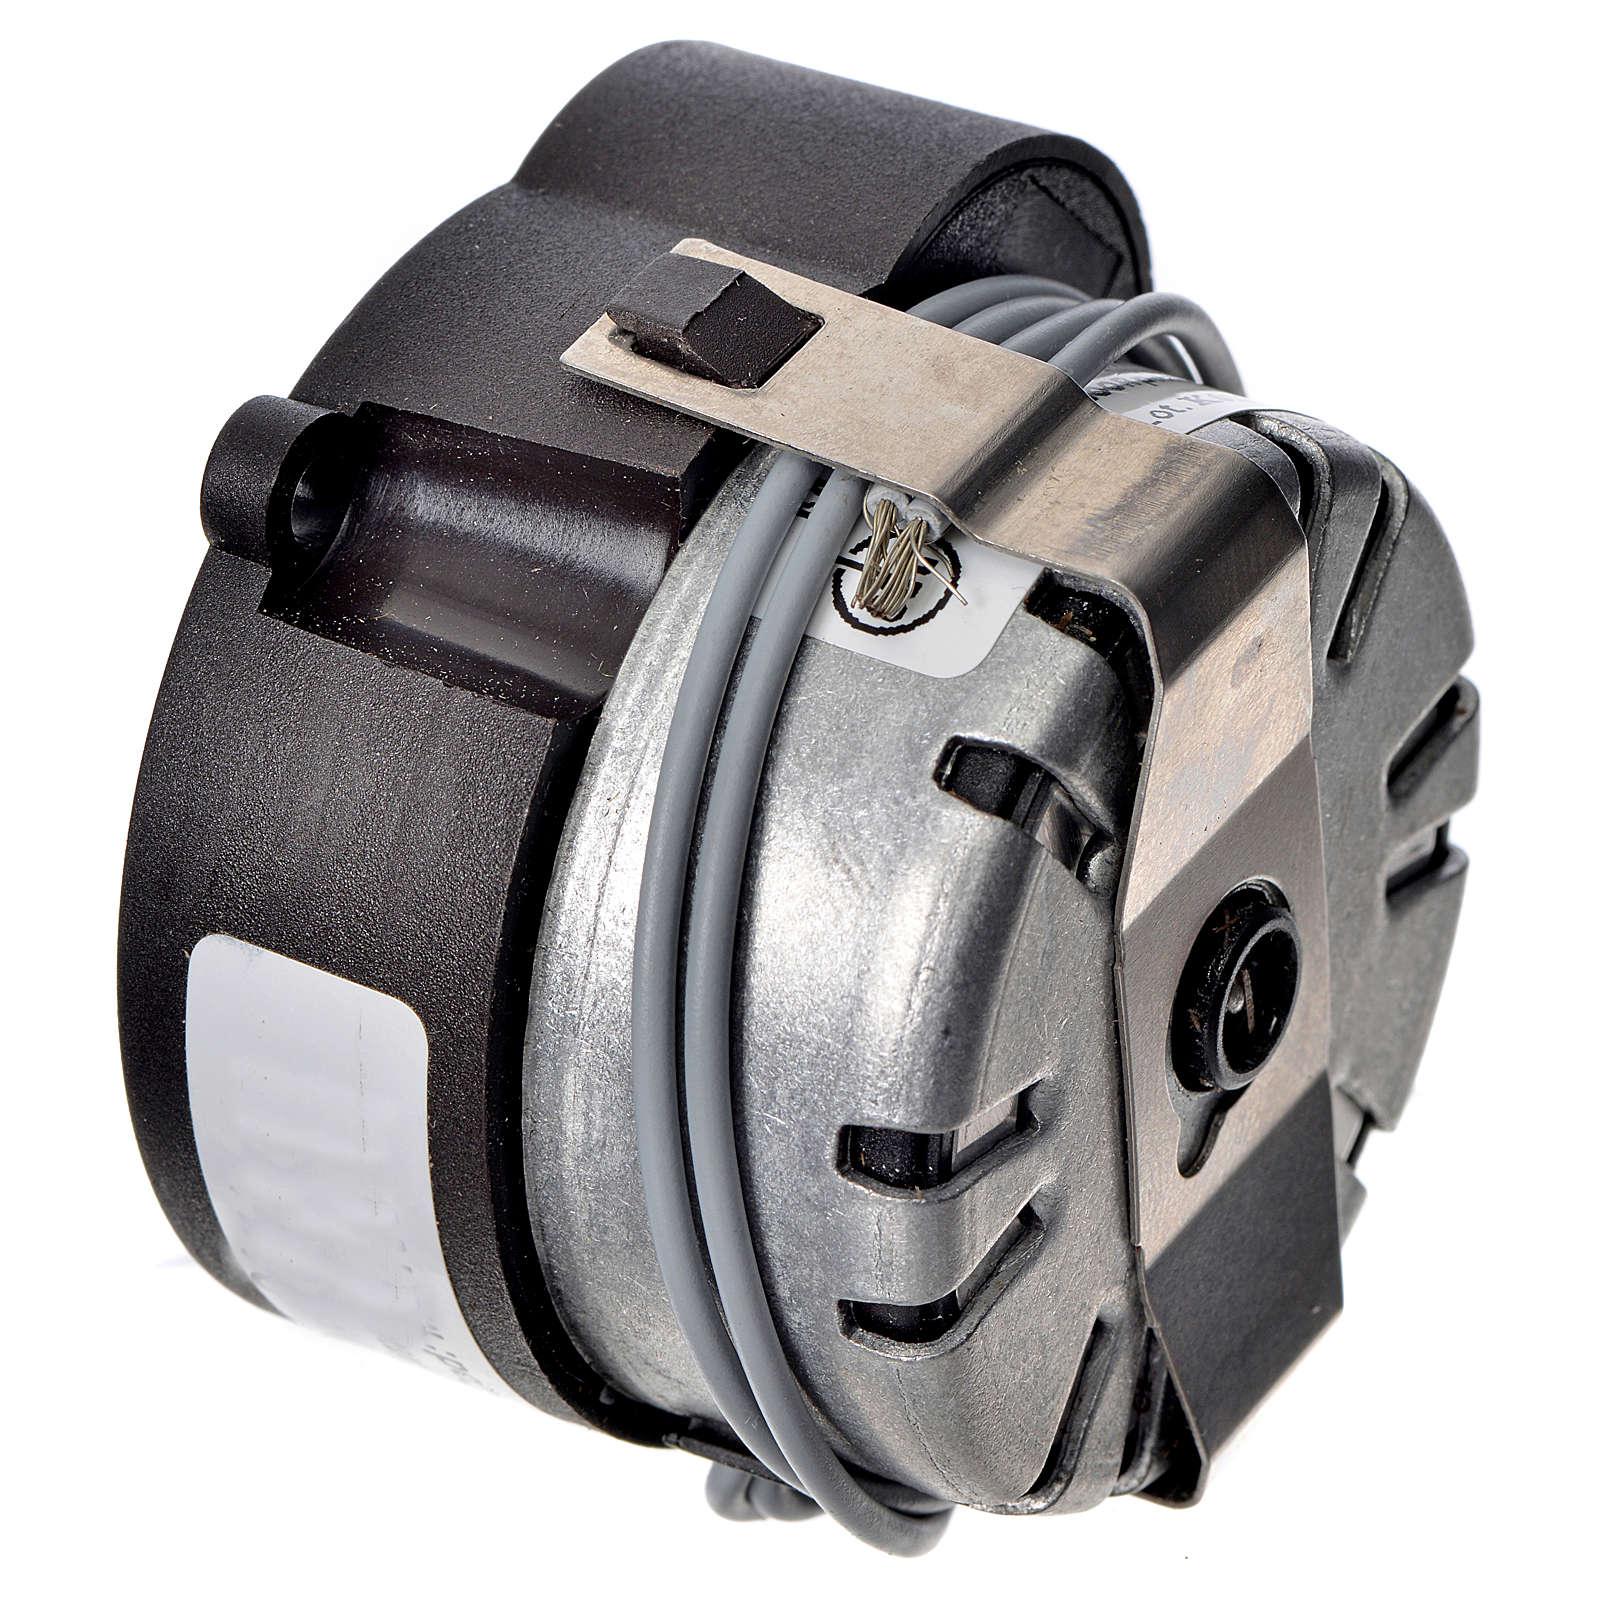 Nativity accessory, MR gear motor, 15 t/m 4